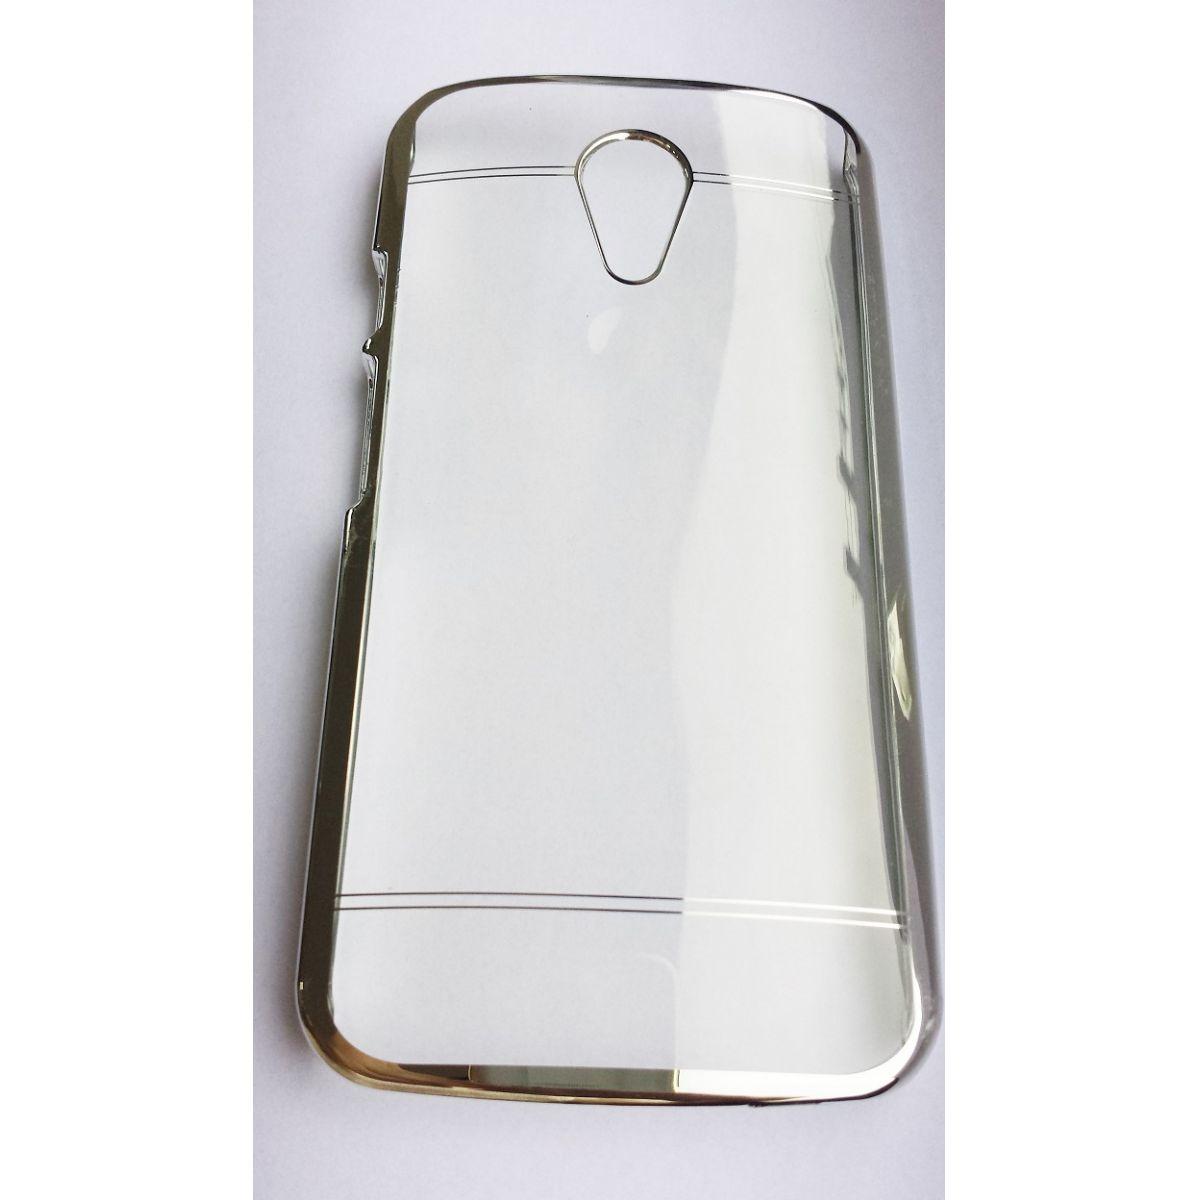 Capa Motorola Moto G2 Borda Metálica 2º geração Xt1068 Xt1069 Cromada